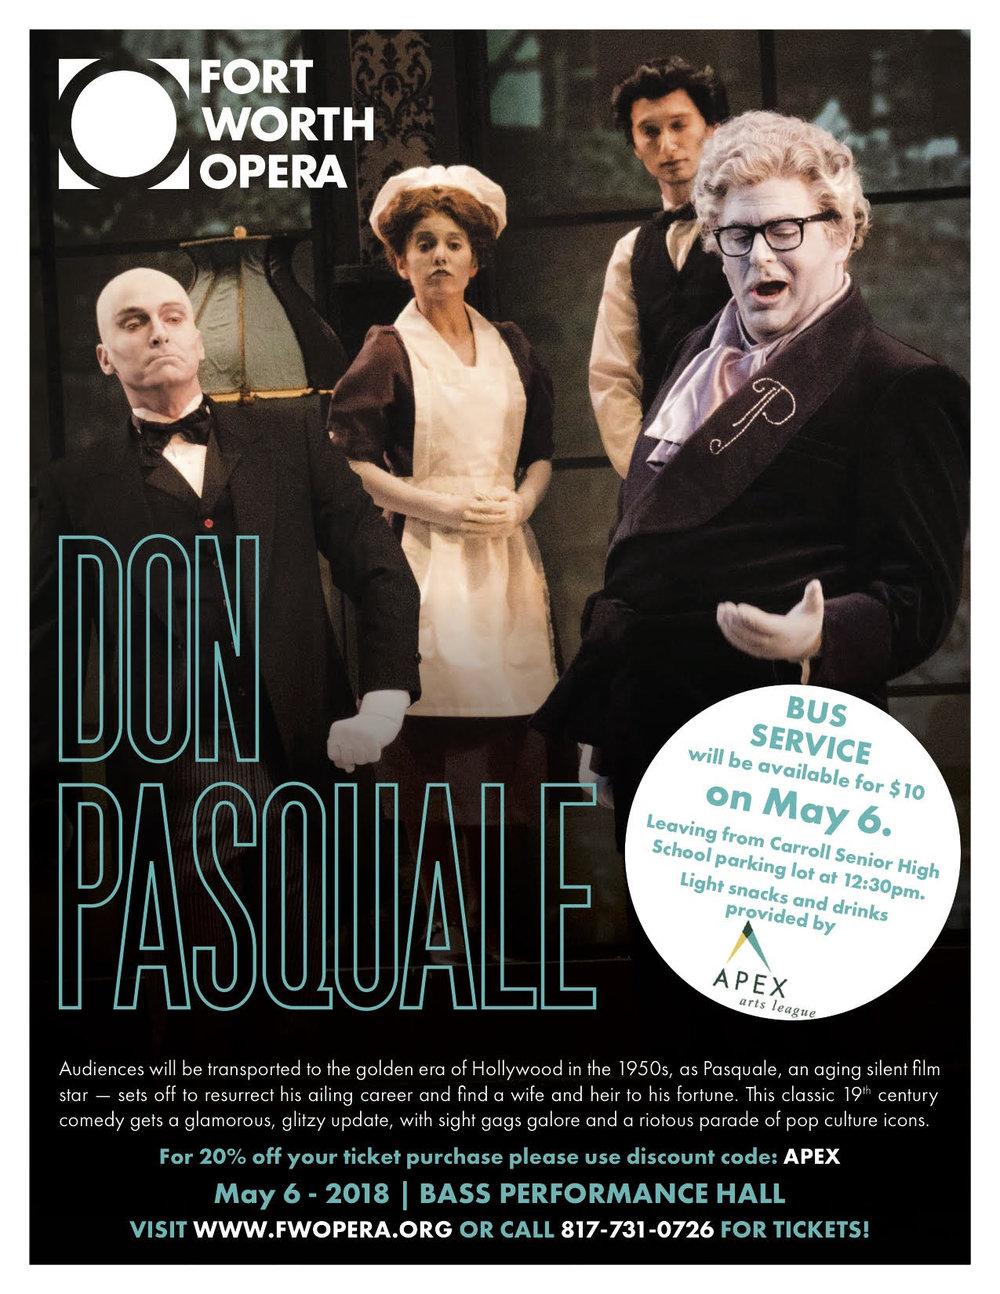 Don Pasquale website.jpg